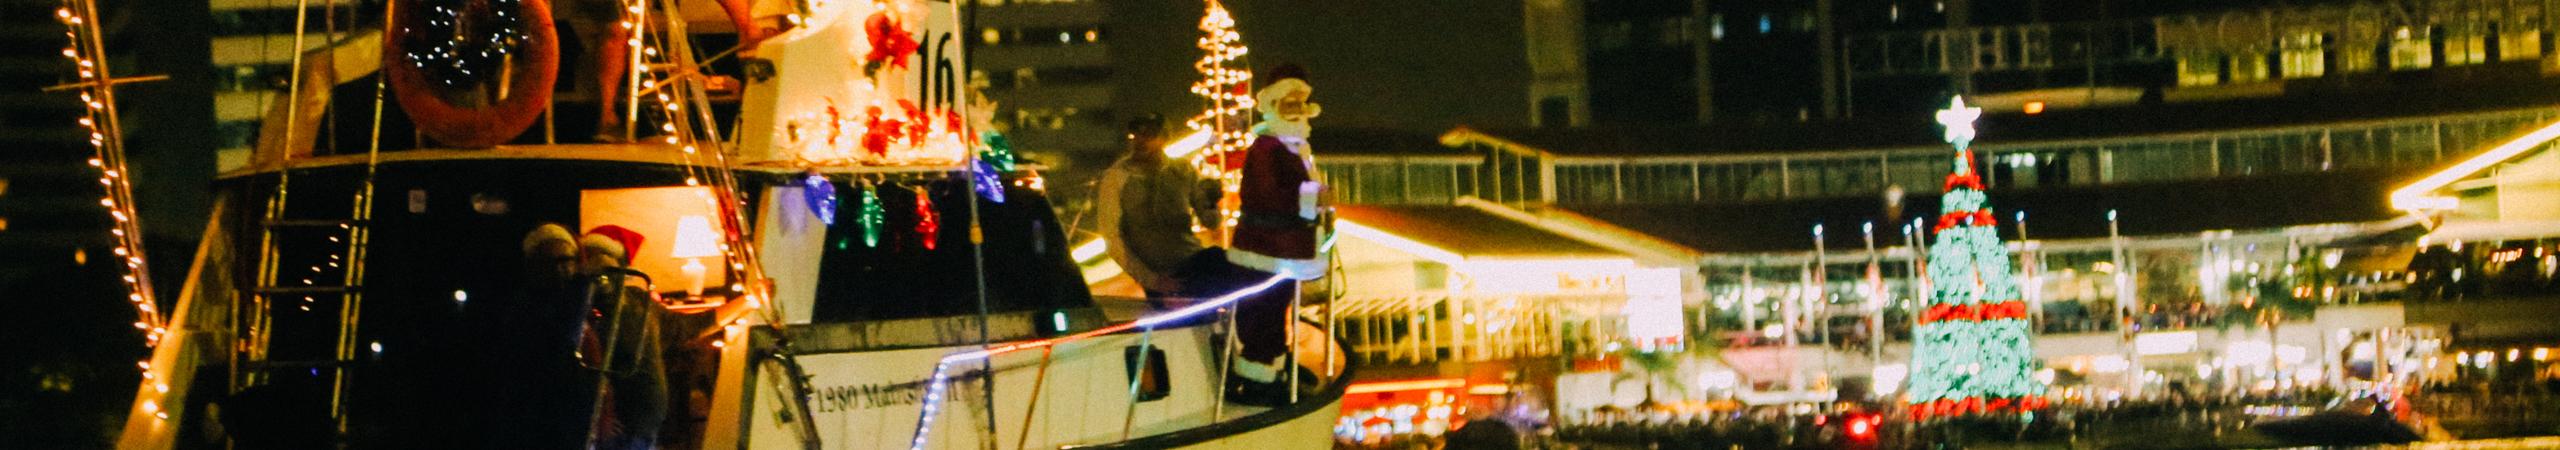 Jacksonville Light Boat Parade